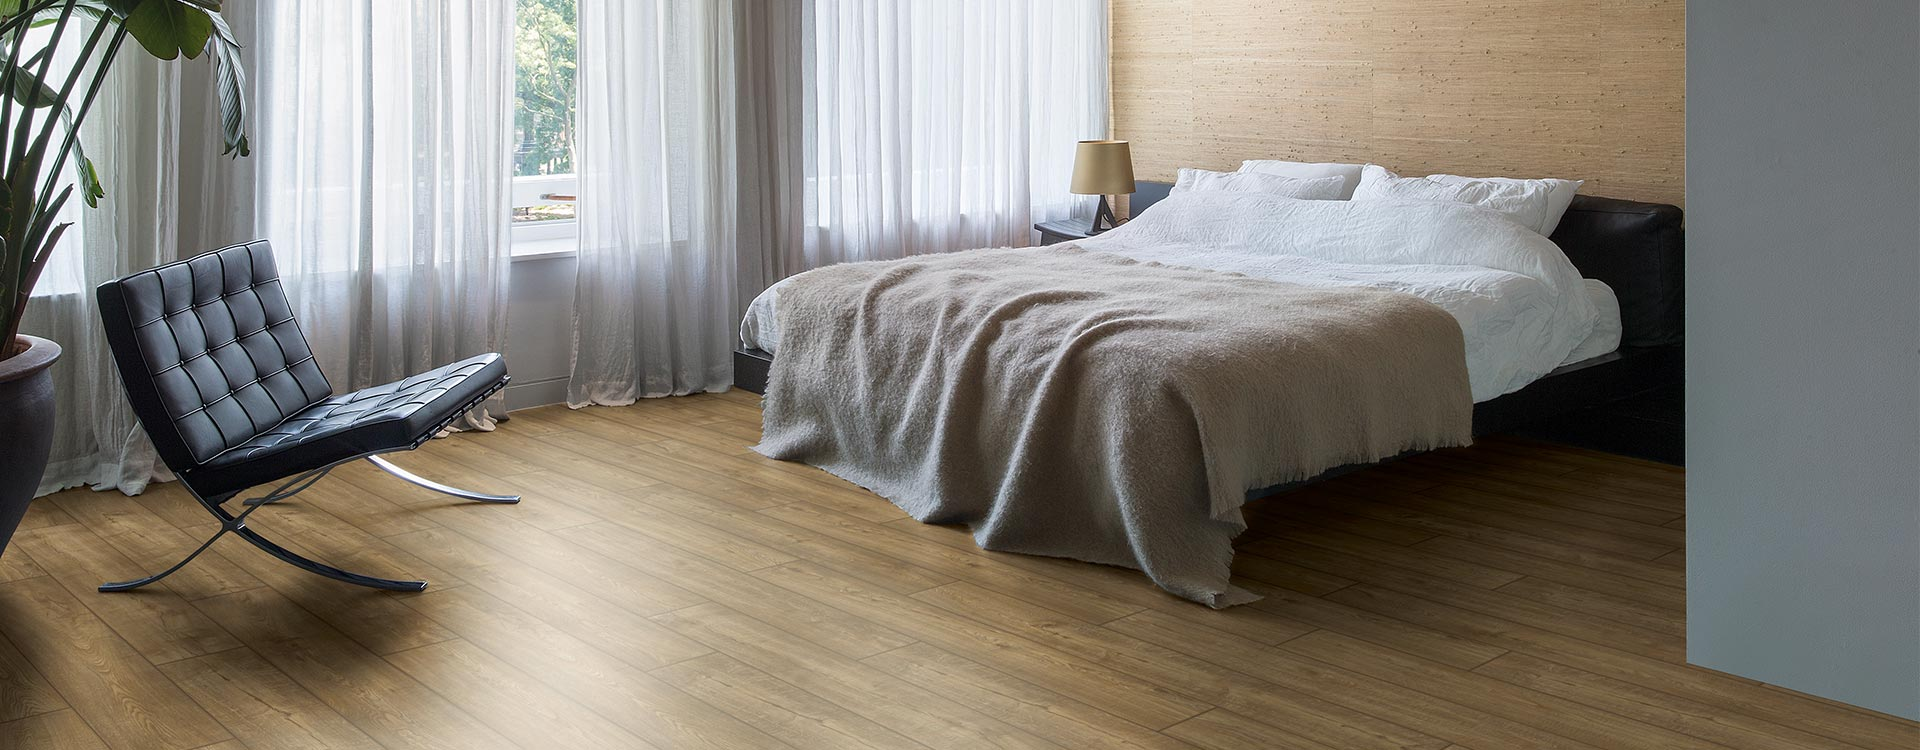 alternativas al suelo de lin leo. Black Bedroom Furniture Sets. Home Design Ideas